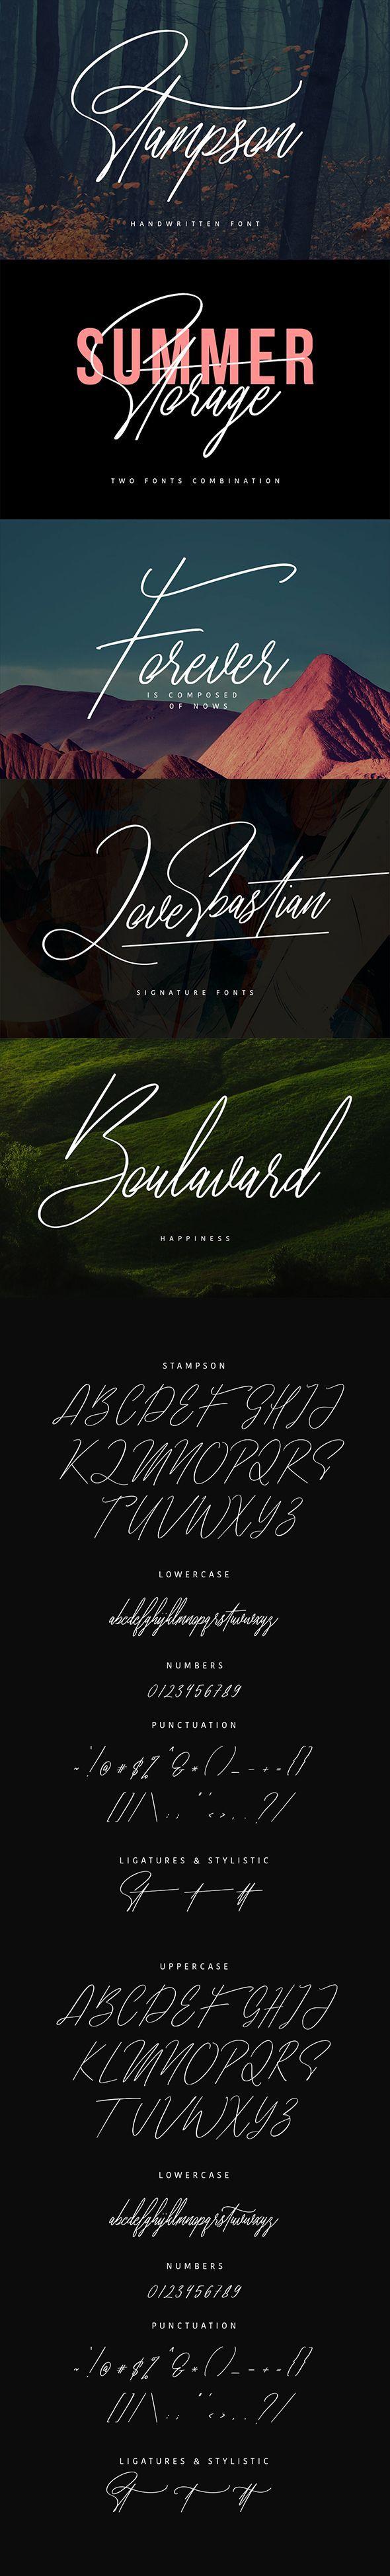 Stampson Signature Font Typeface, Signature fonts, Fancy